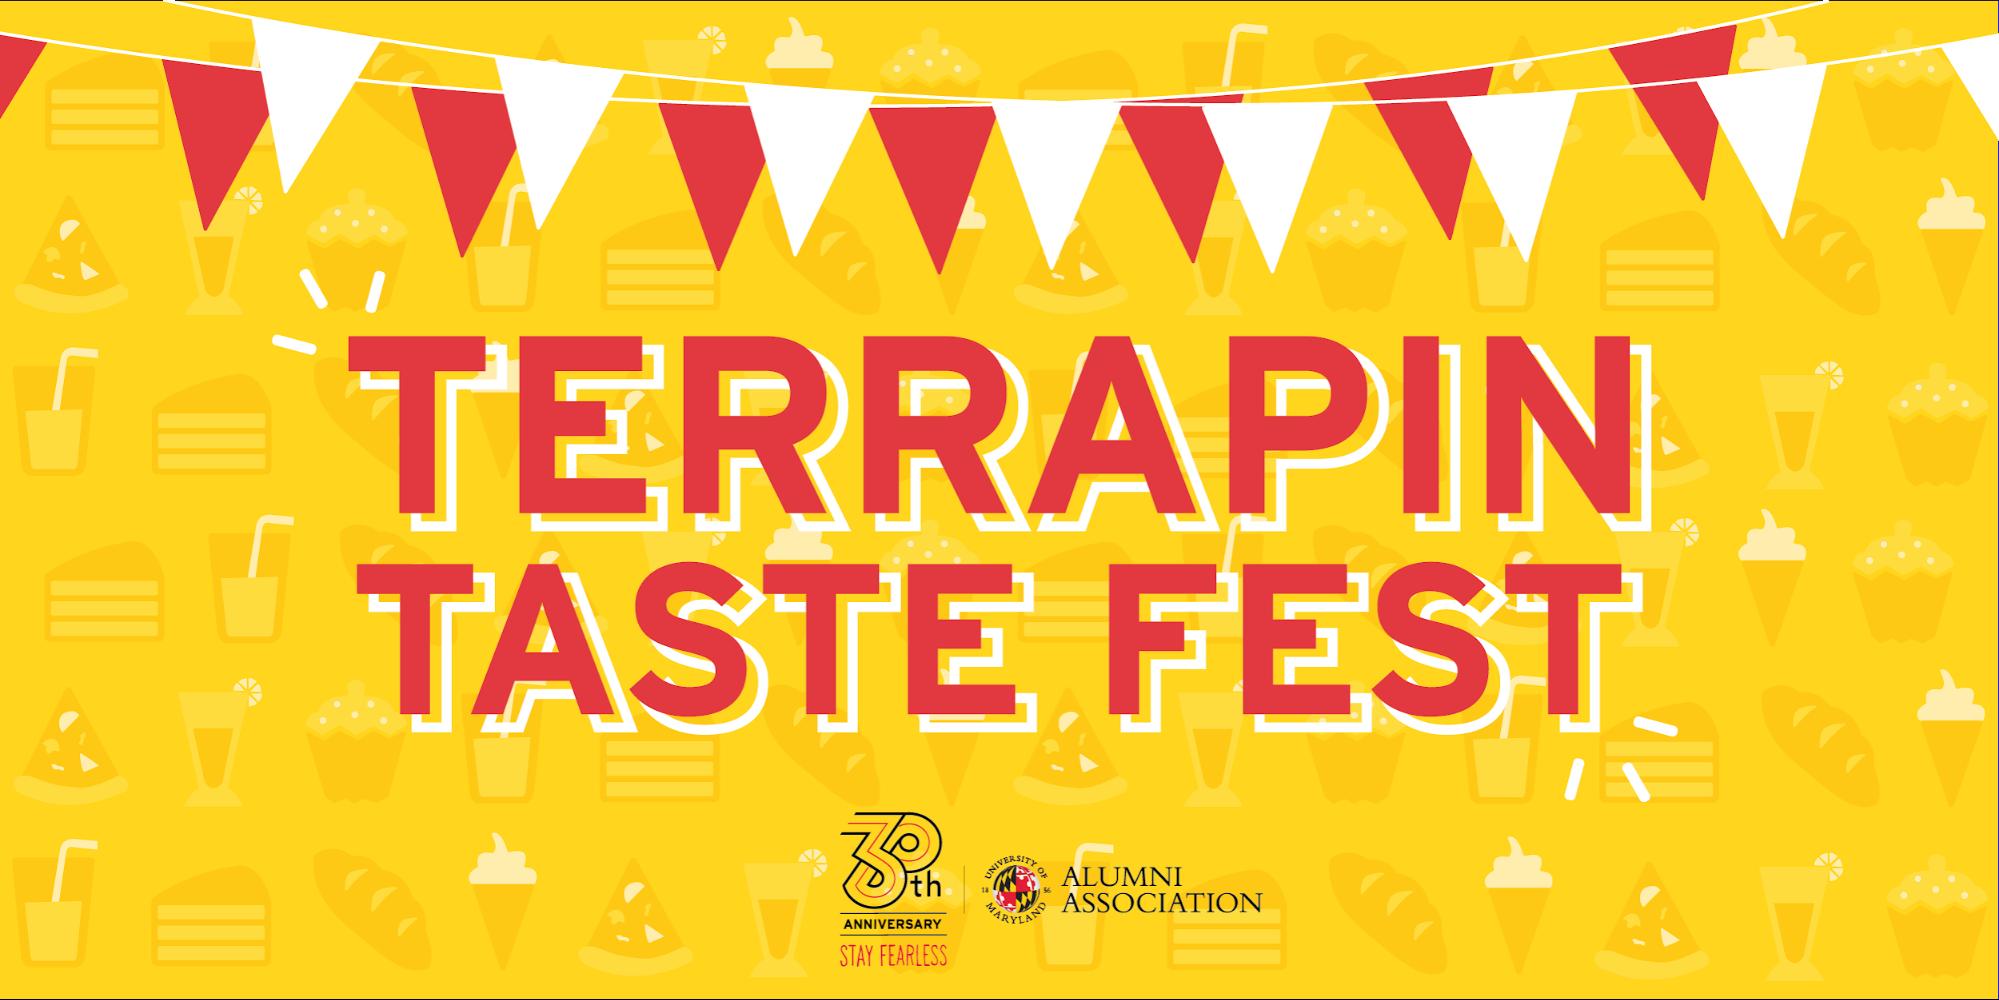 Terrapin Taste Fest